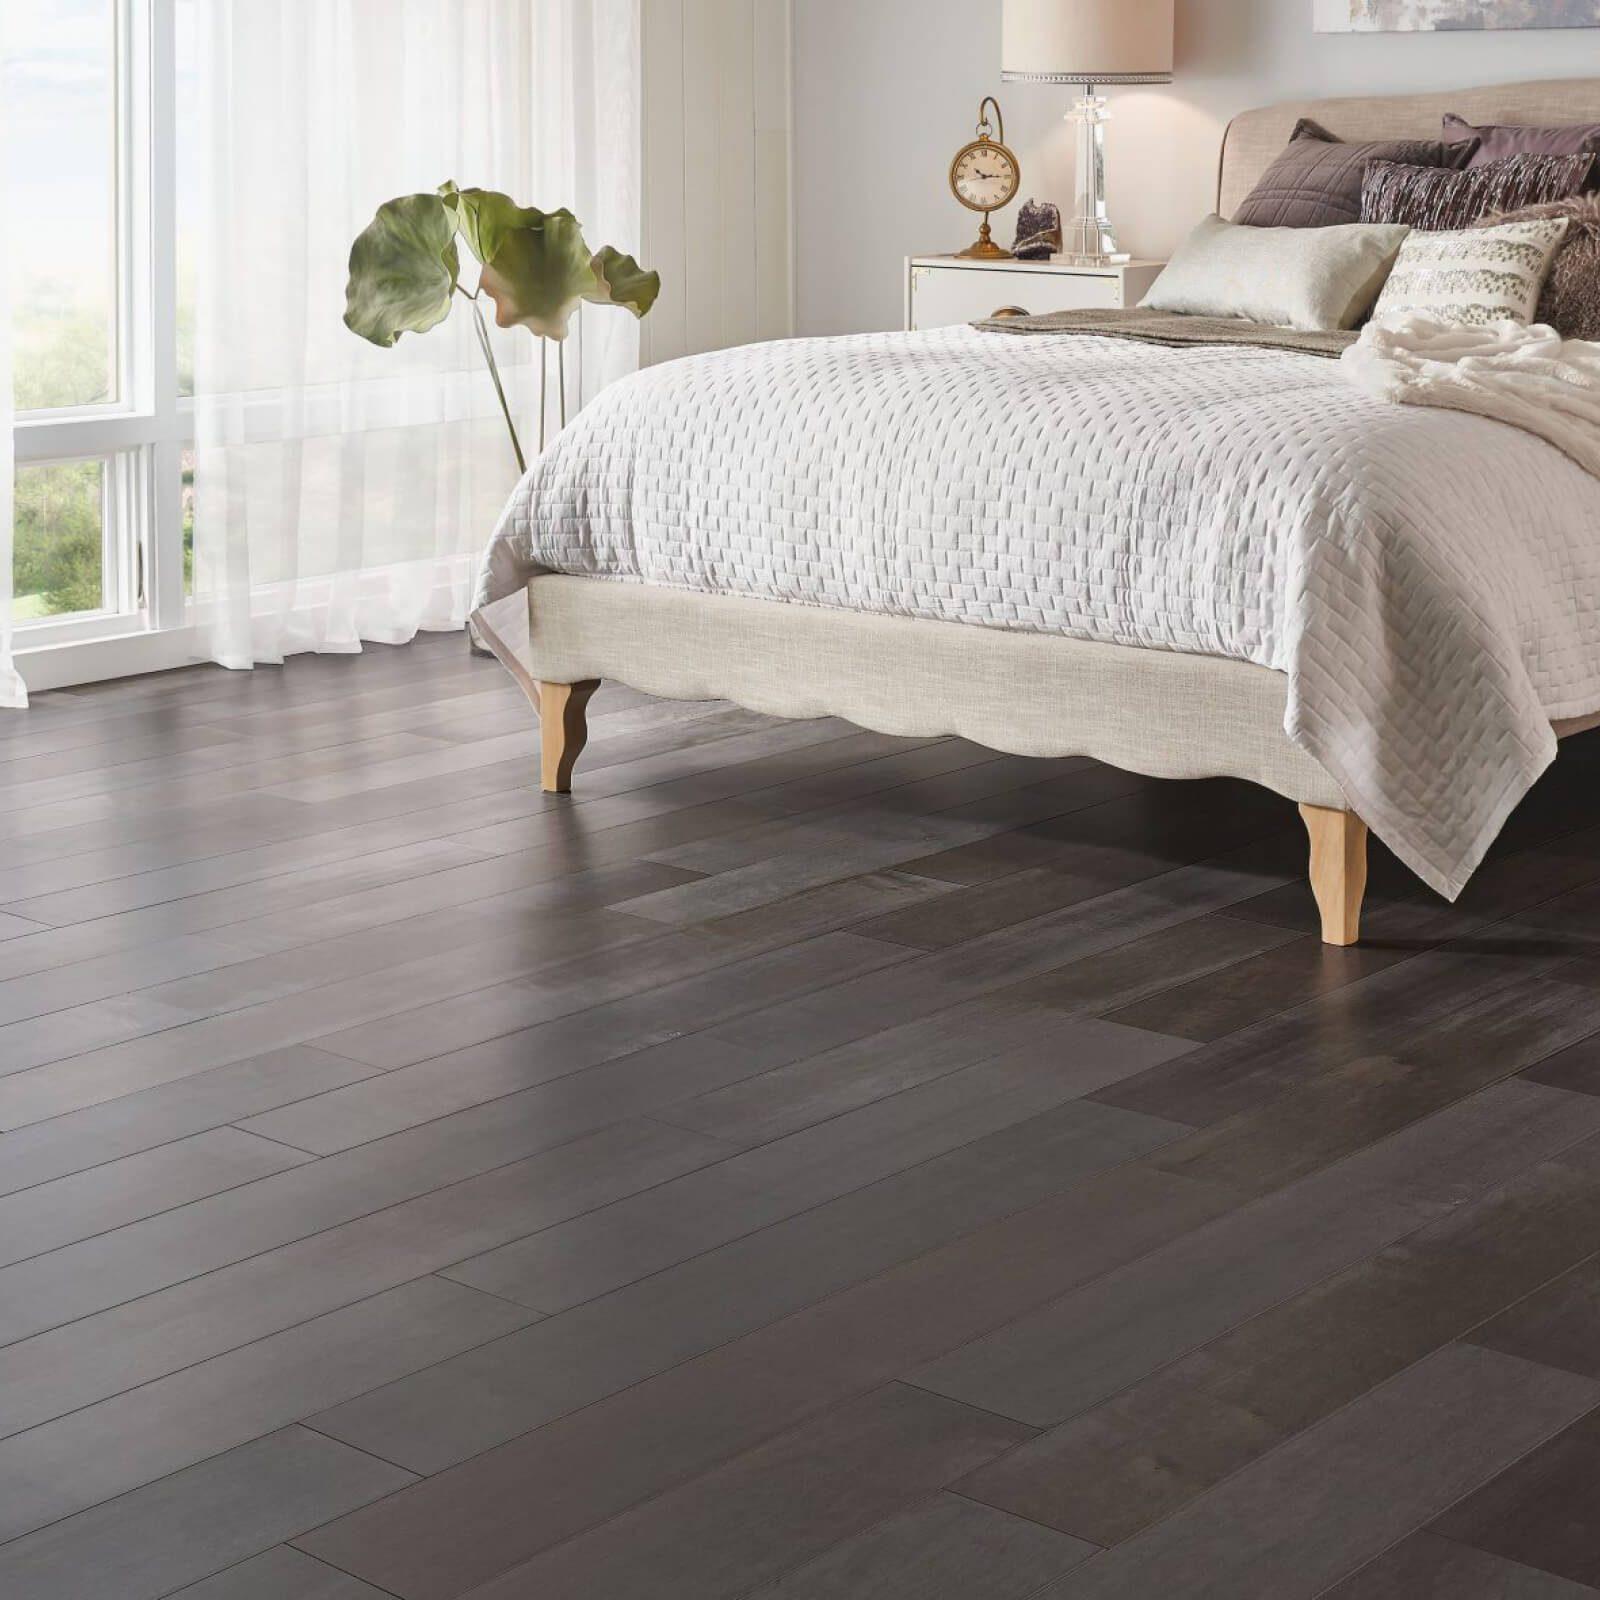 Bedroom hardwood flooring | Broadway Carpets, Inc